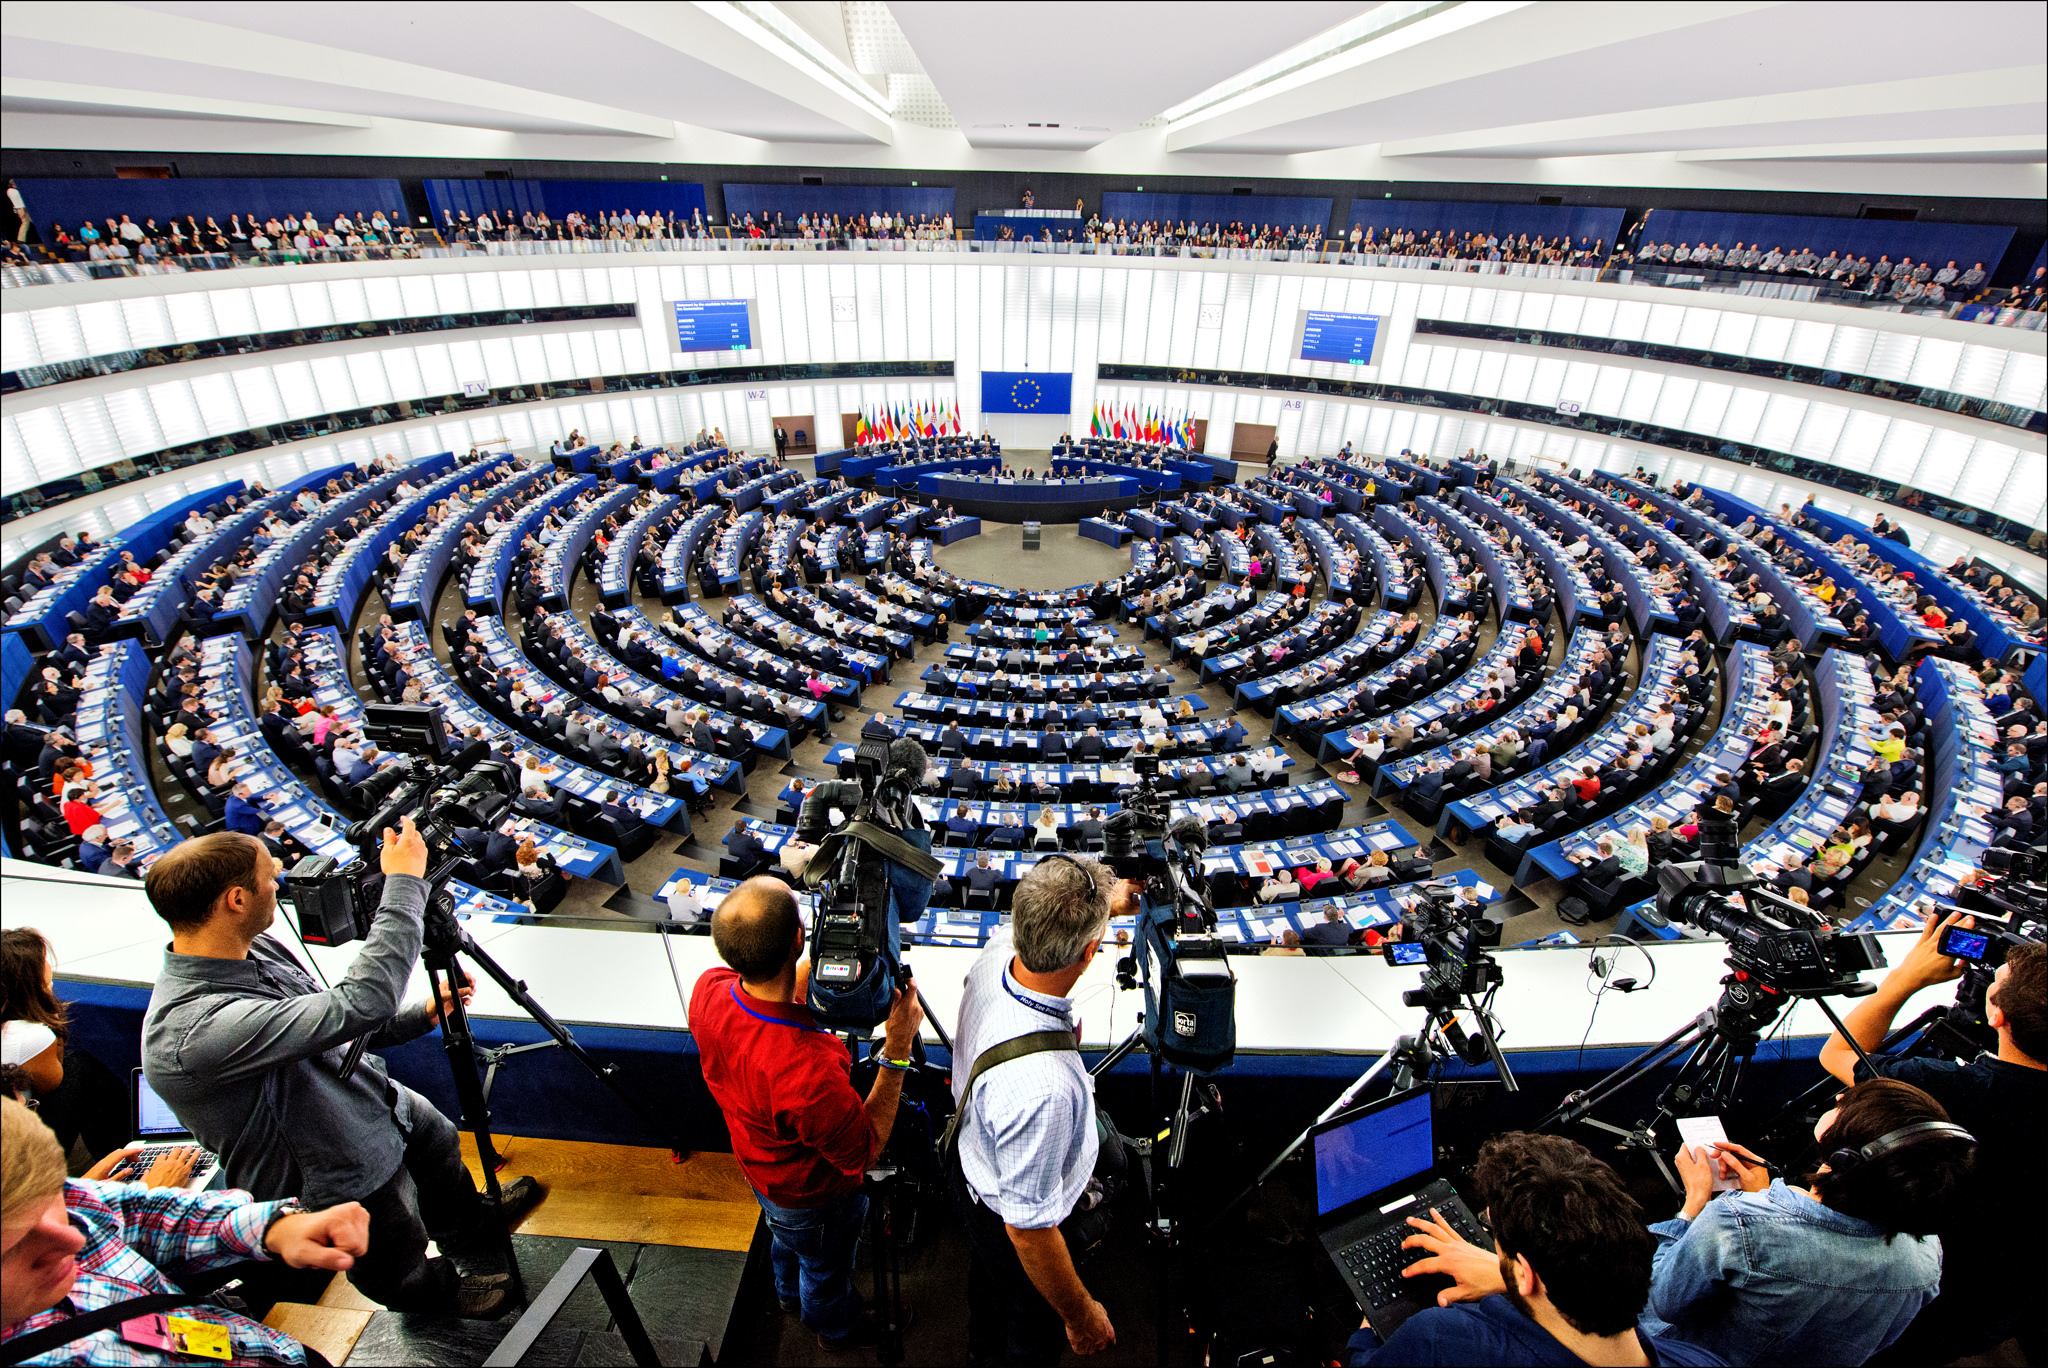 Foto: Europaparlamentet (CC BY-NC-ND 2.0)